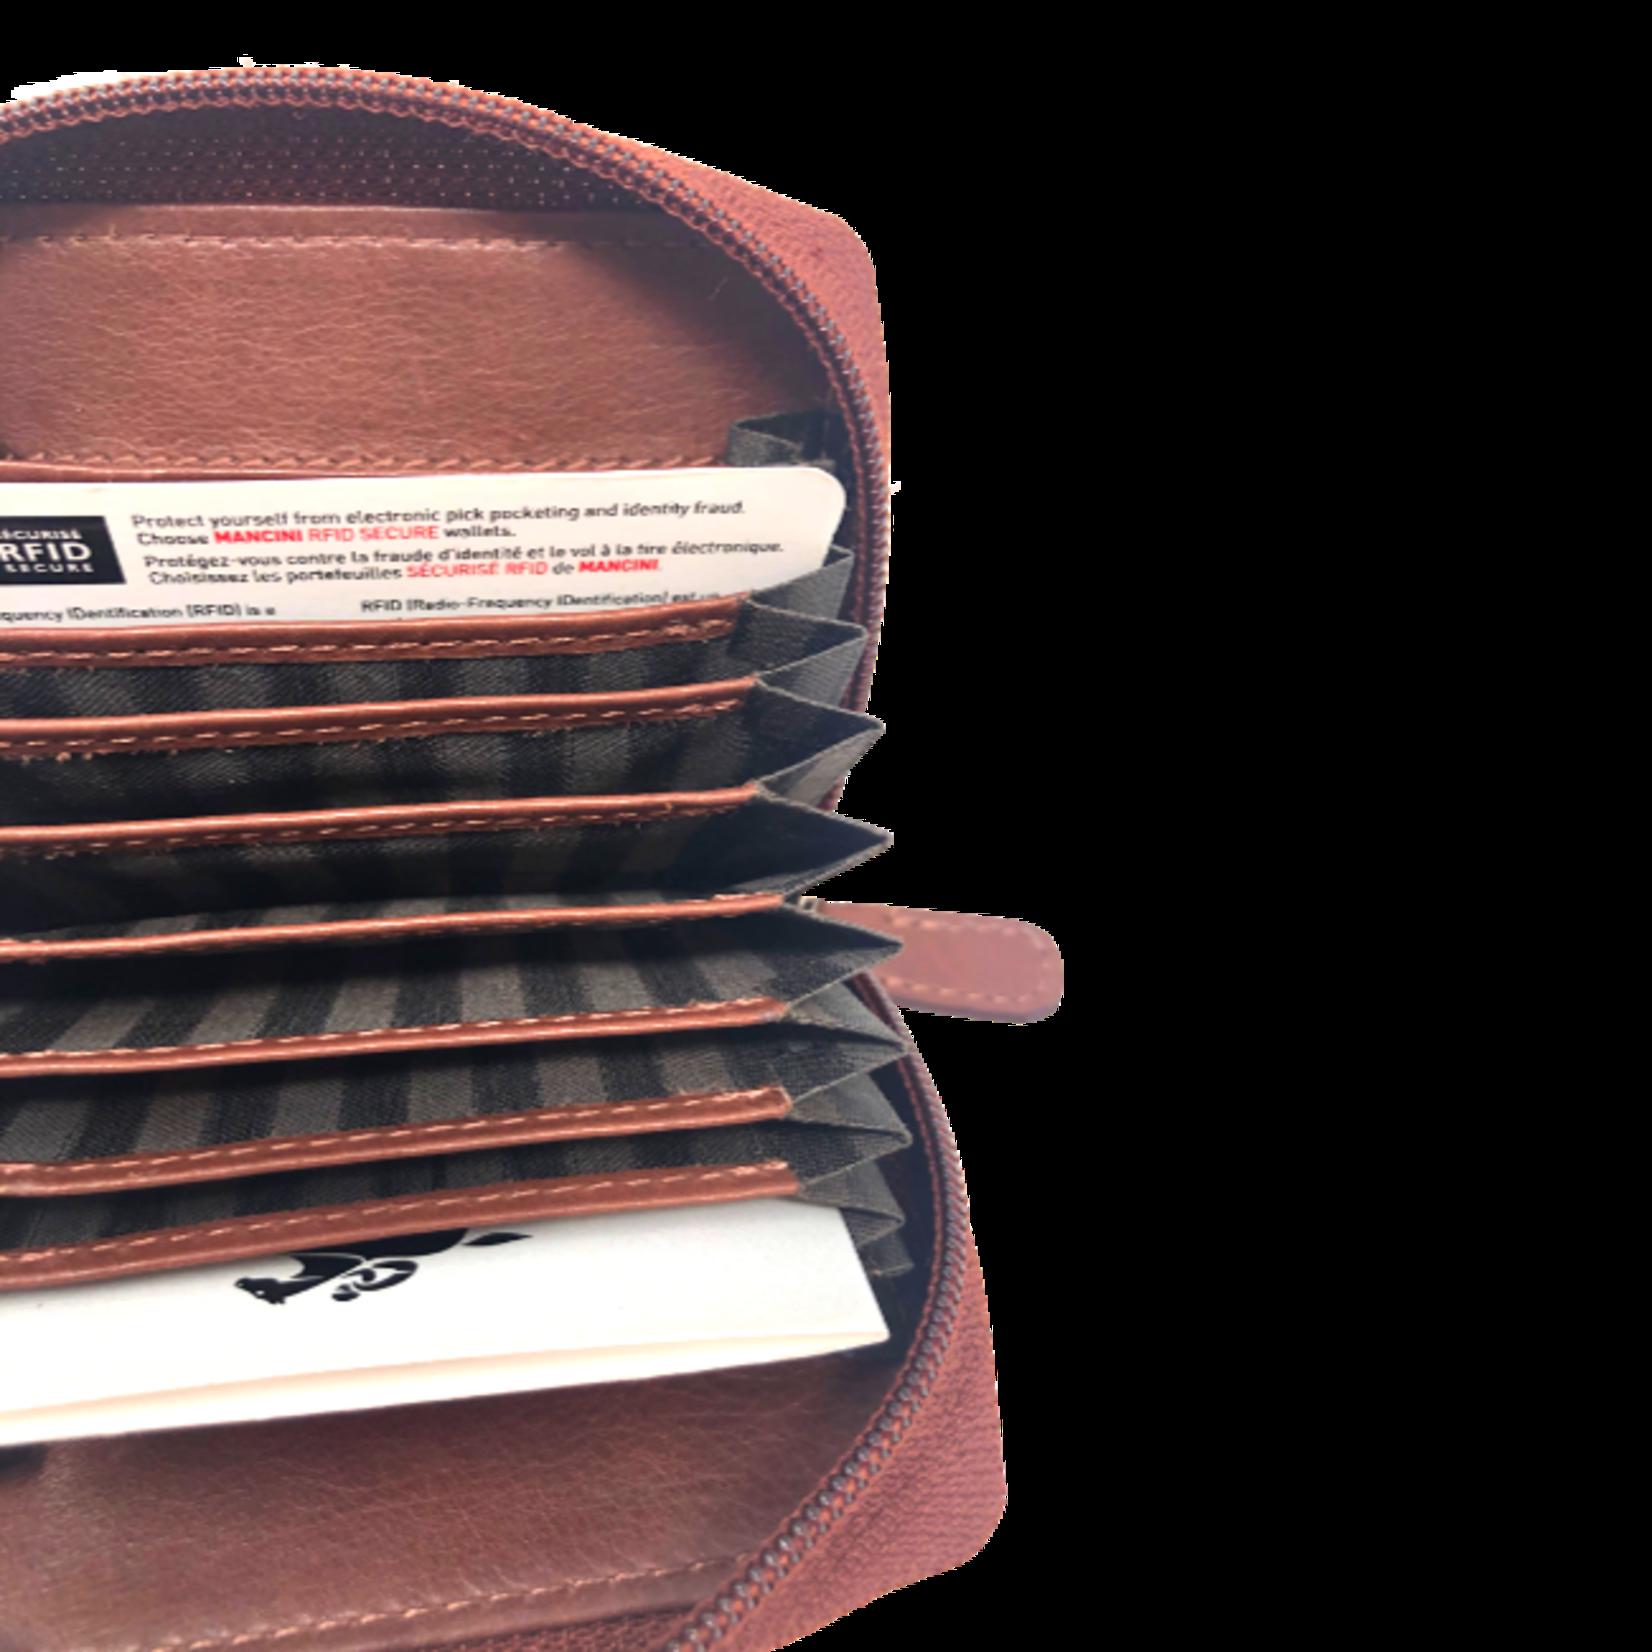 MANCINI ACCORDION CREDIT CARD CASE